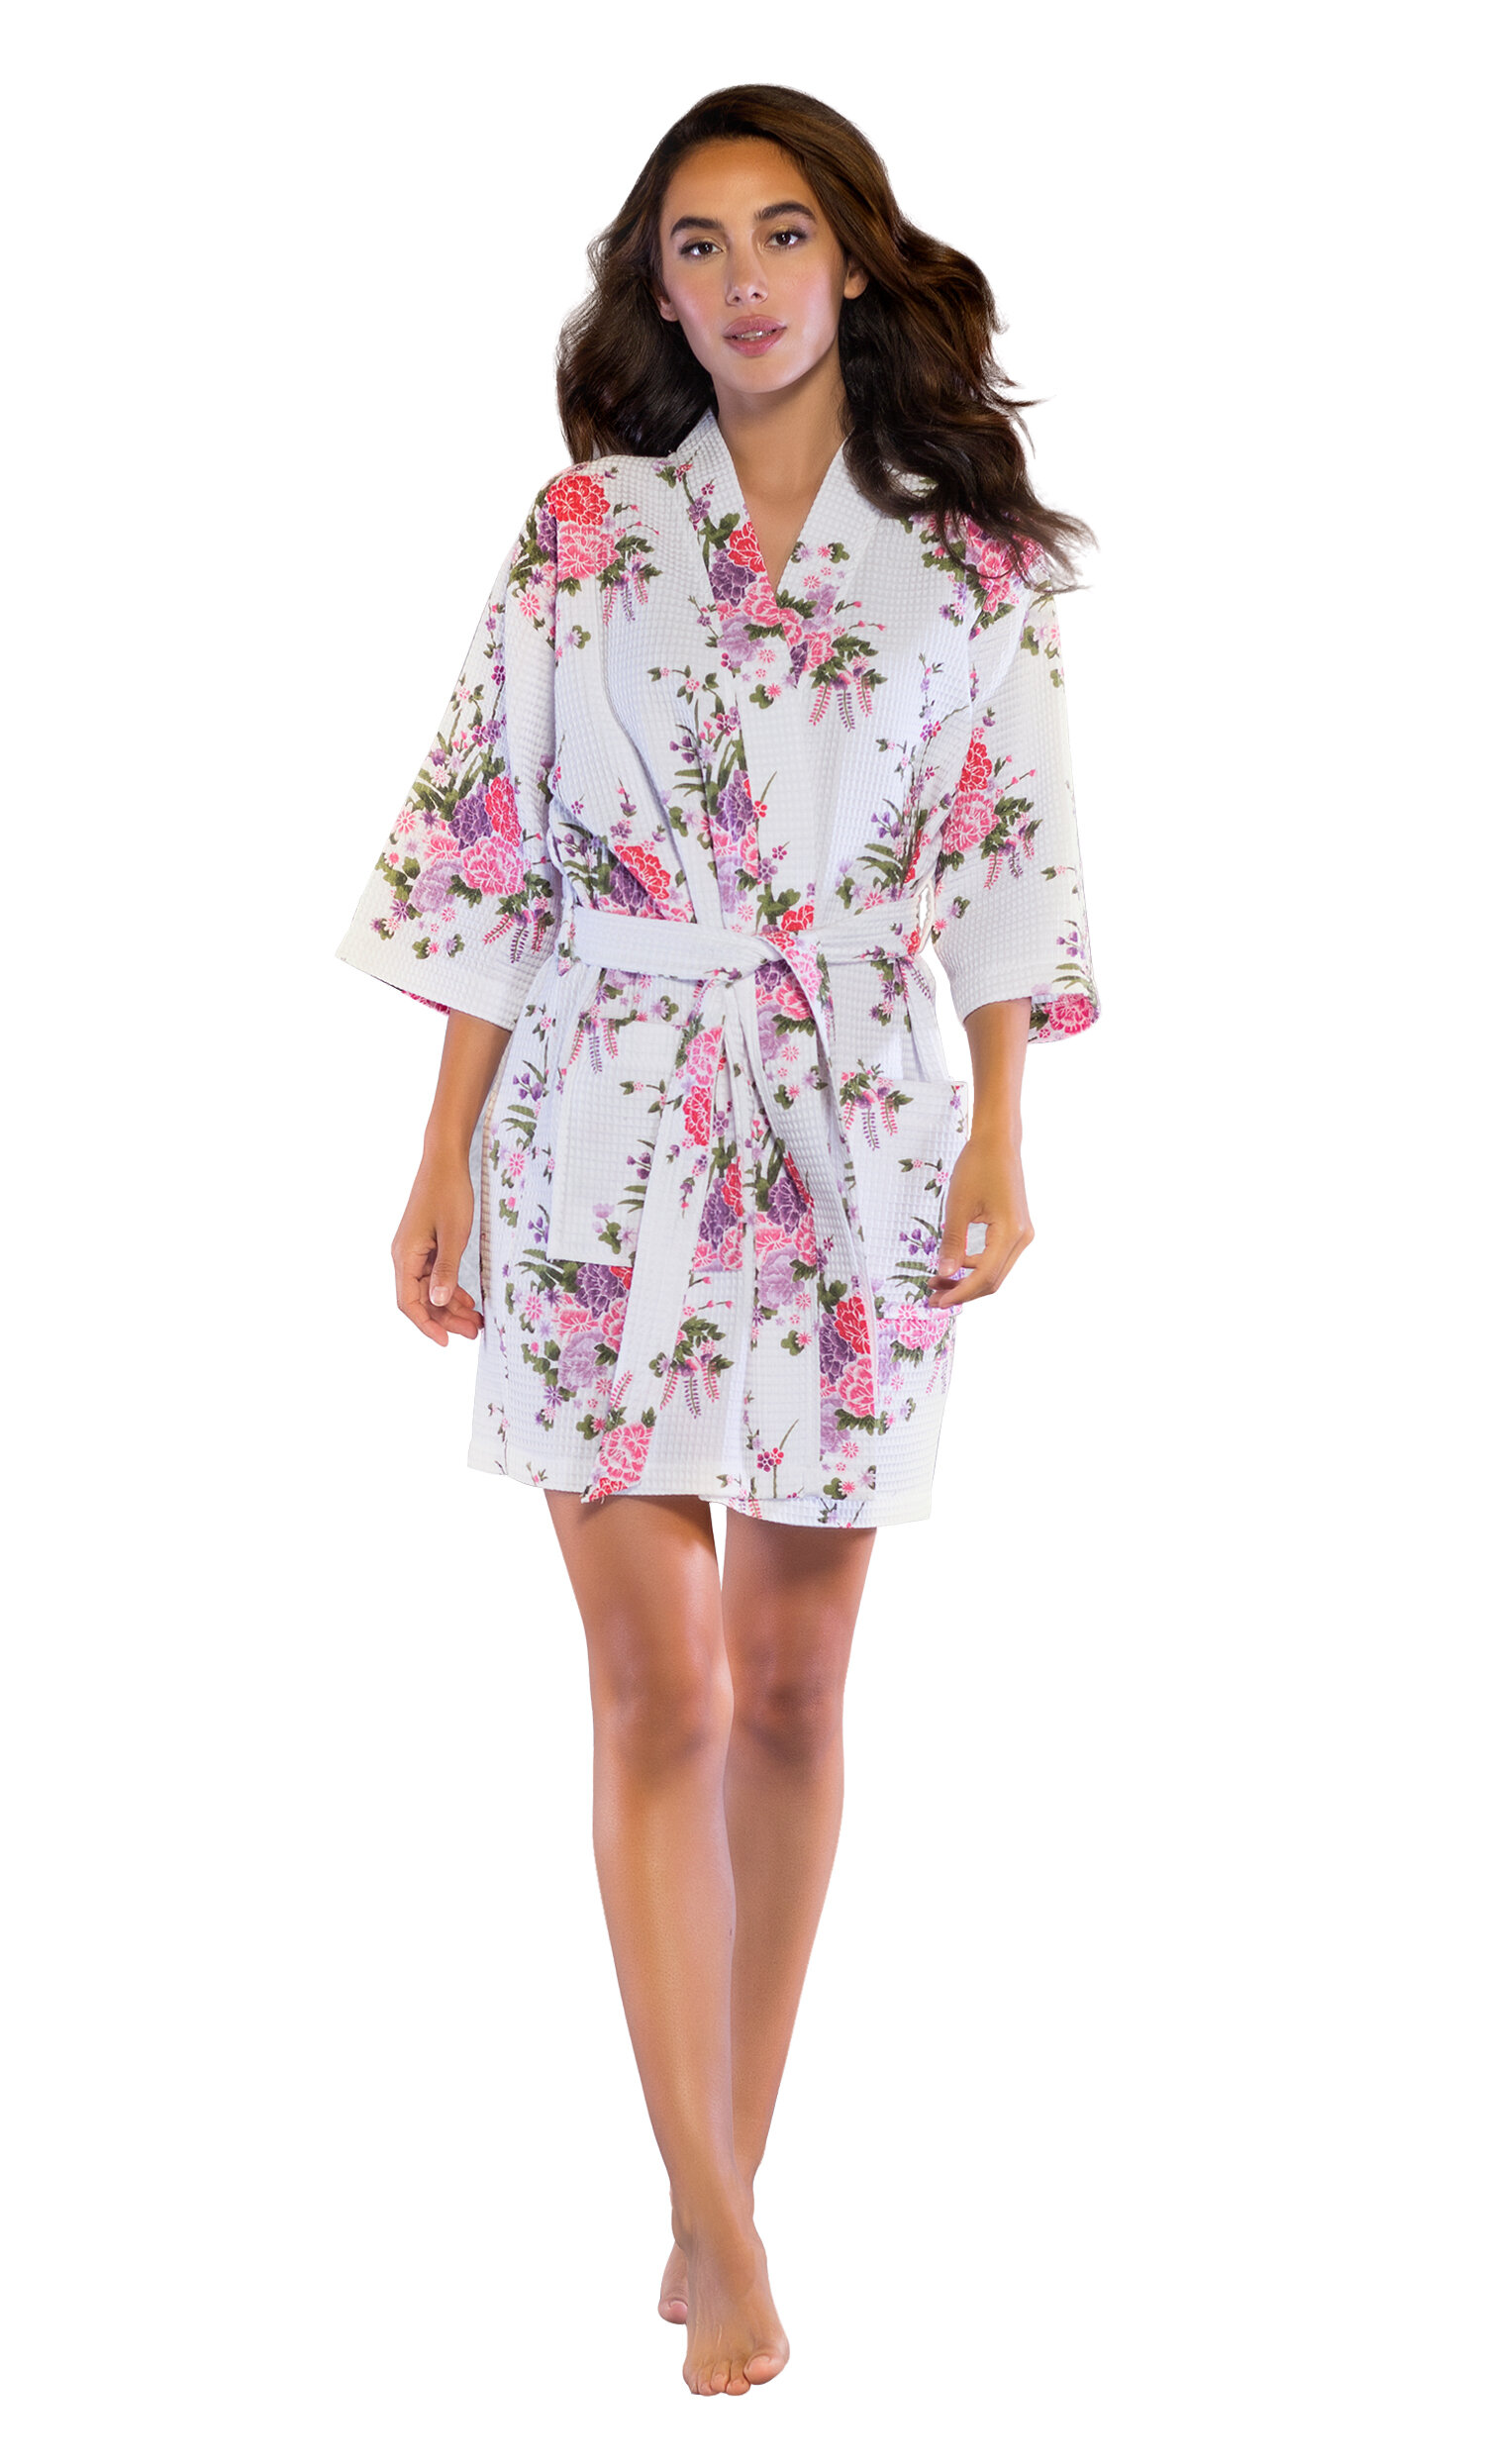 f036247af6 Turquaz Linen Kimono Bridesmaids Spa Knee Length Cotton Blend Waffle  Bathrobe